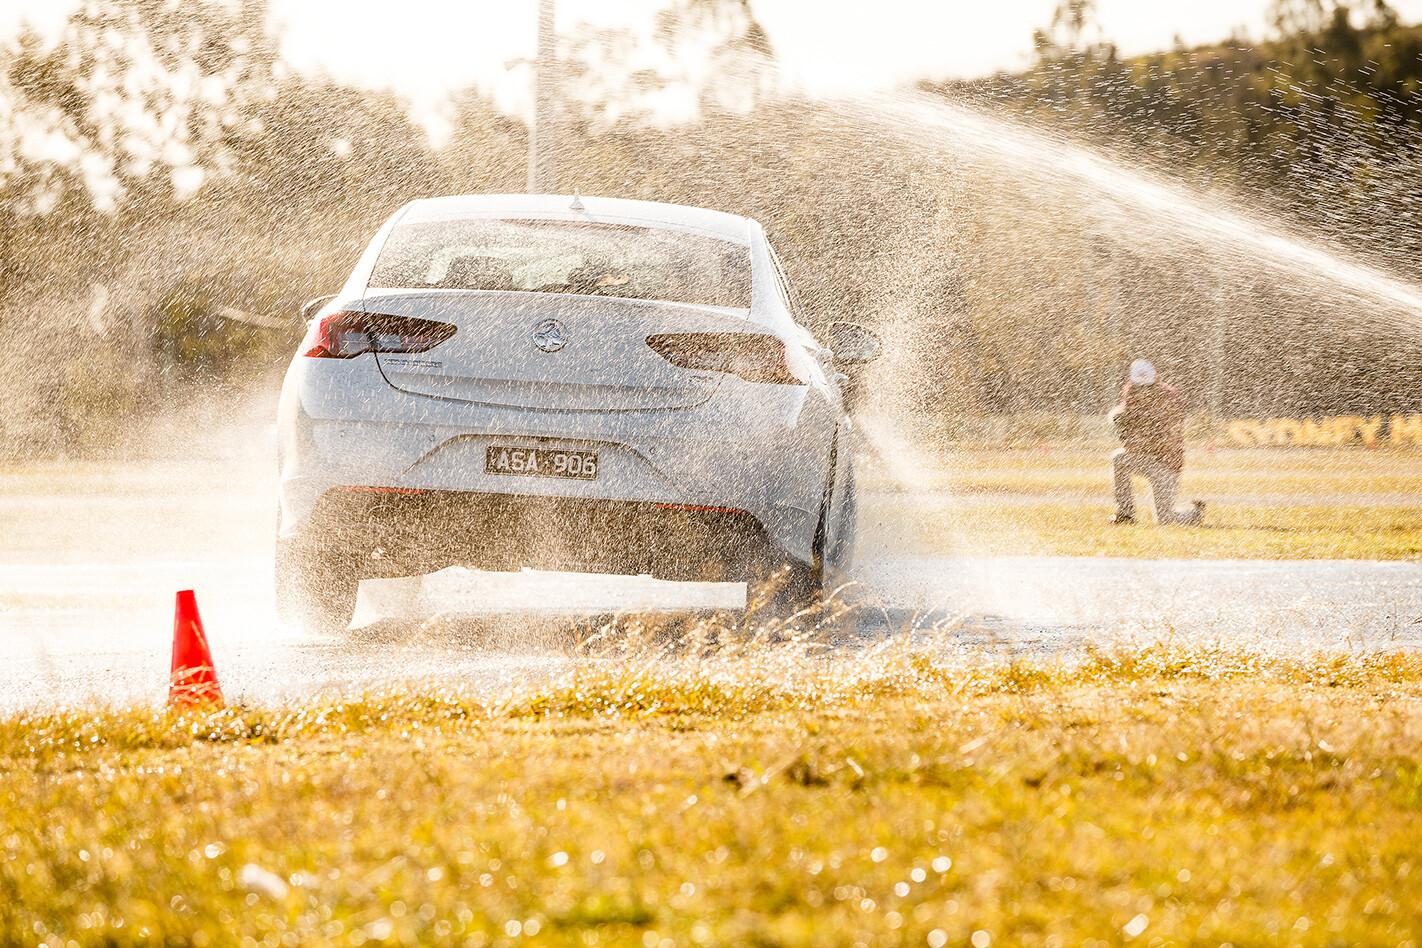 2018 Wheels Tyre Test: Wet Cornering